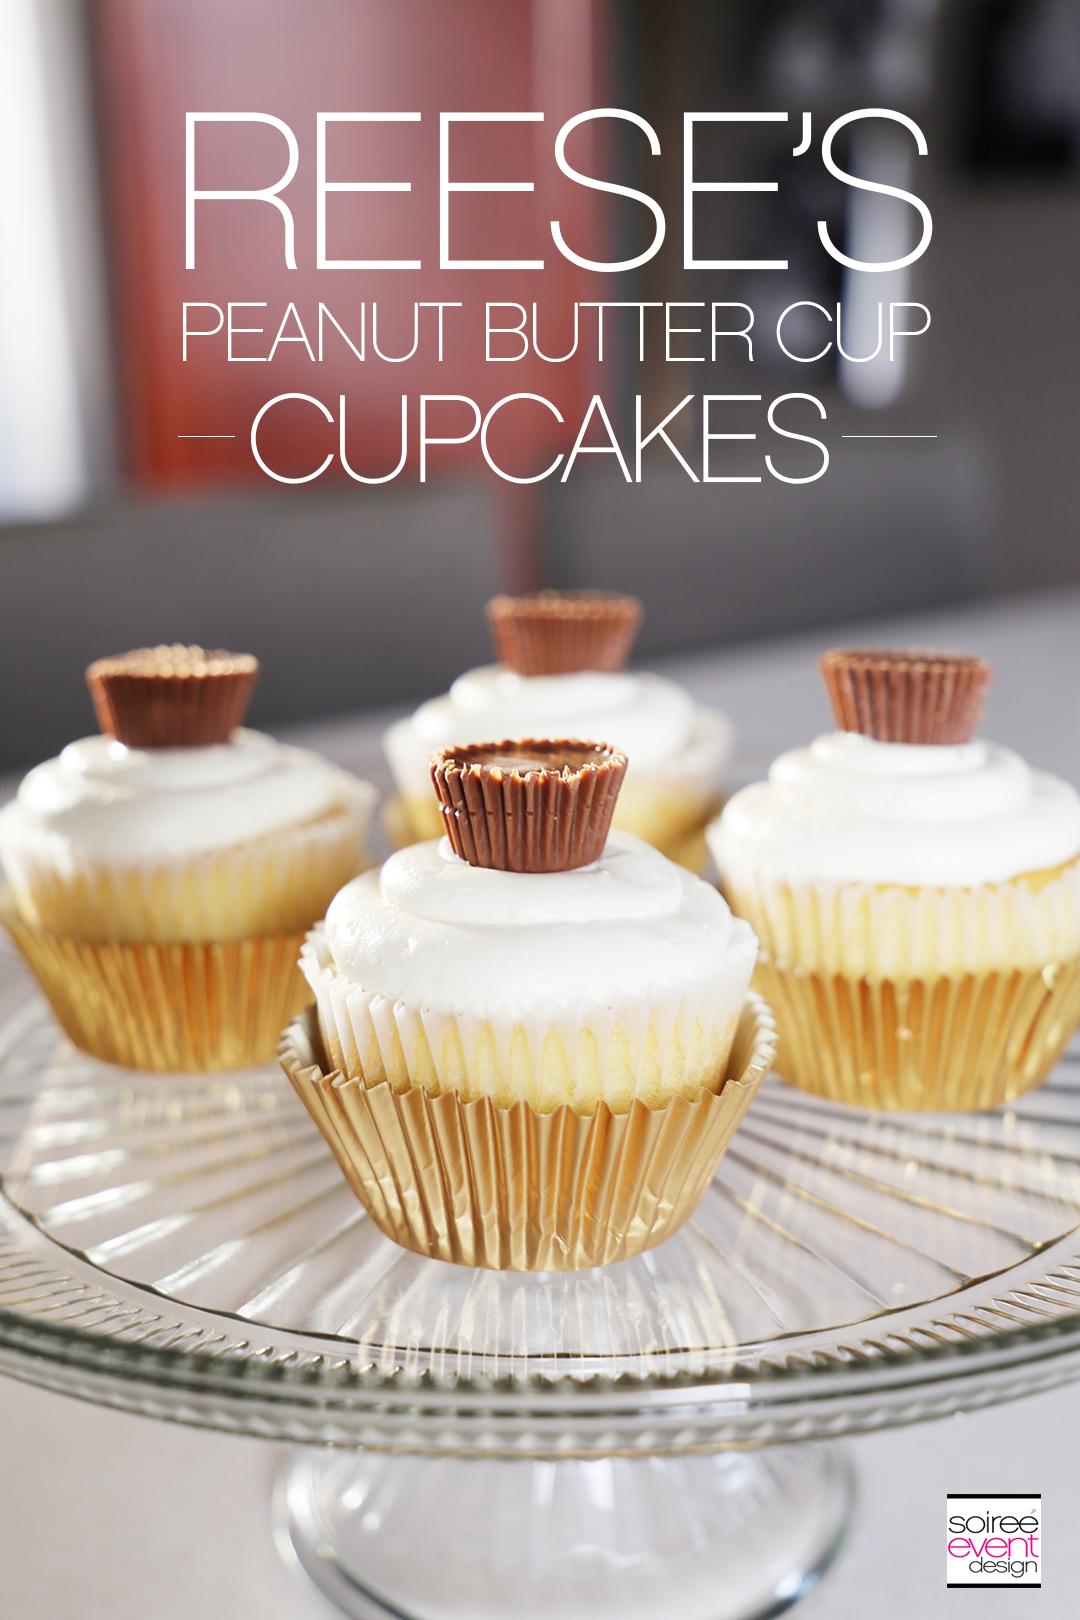 'S Peanut Butter Cup Cupcakes - Recipe